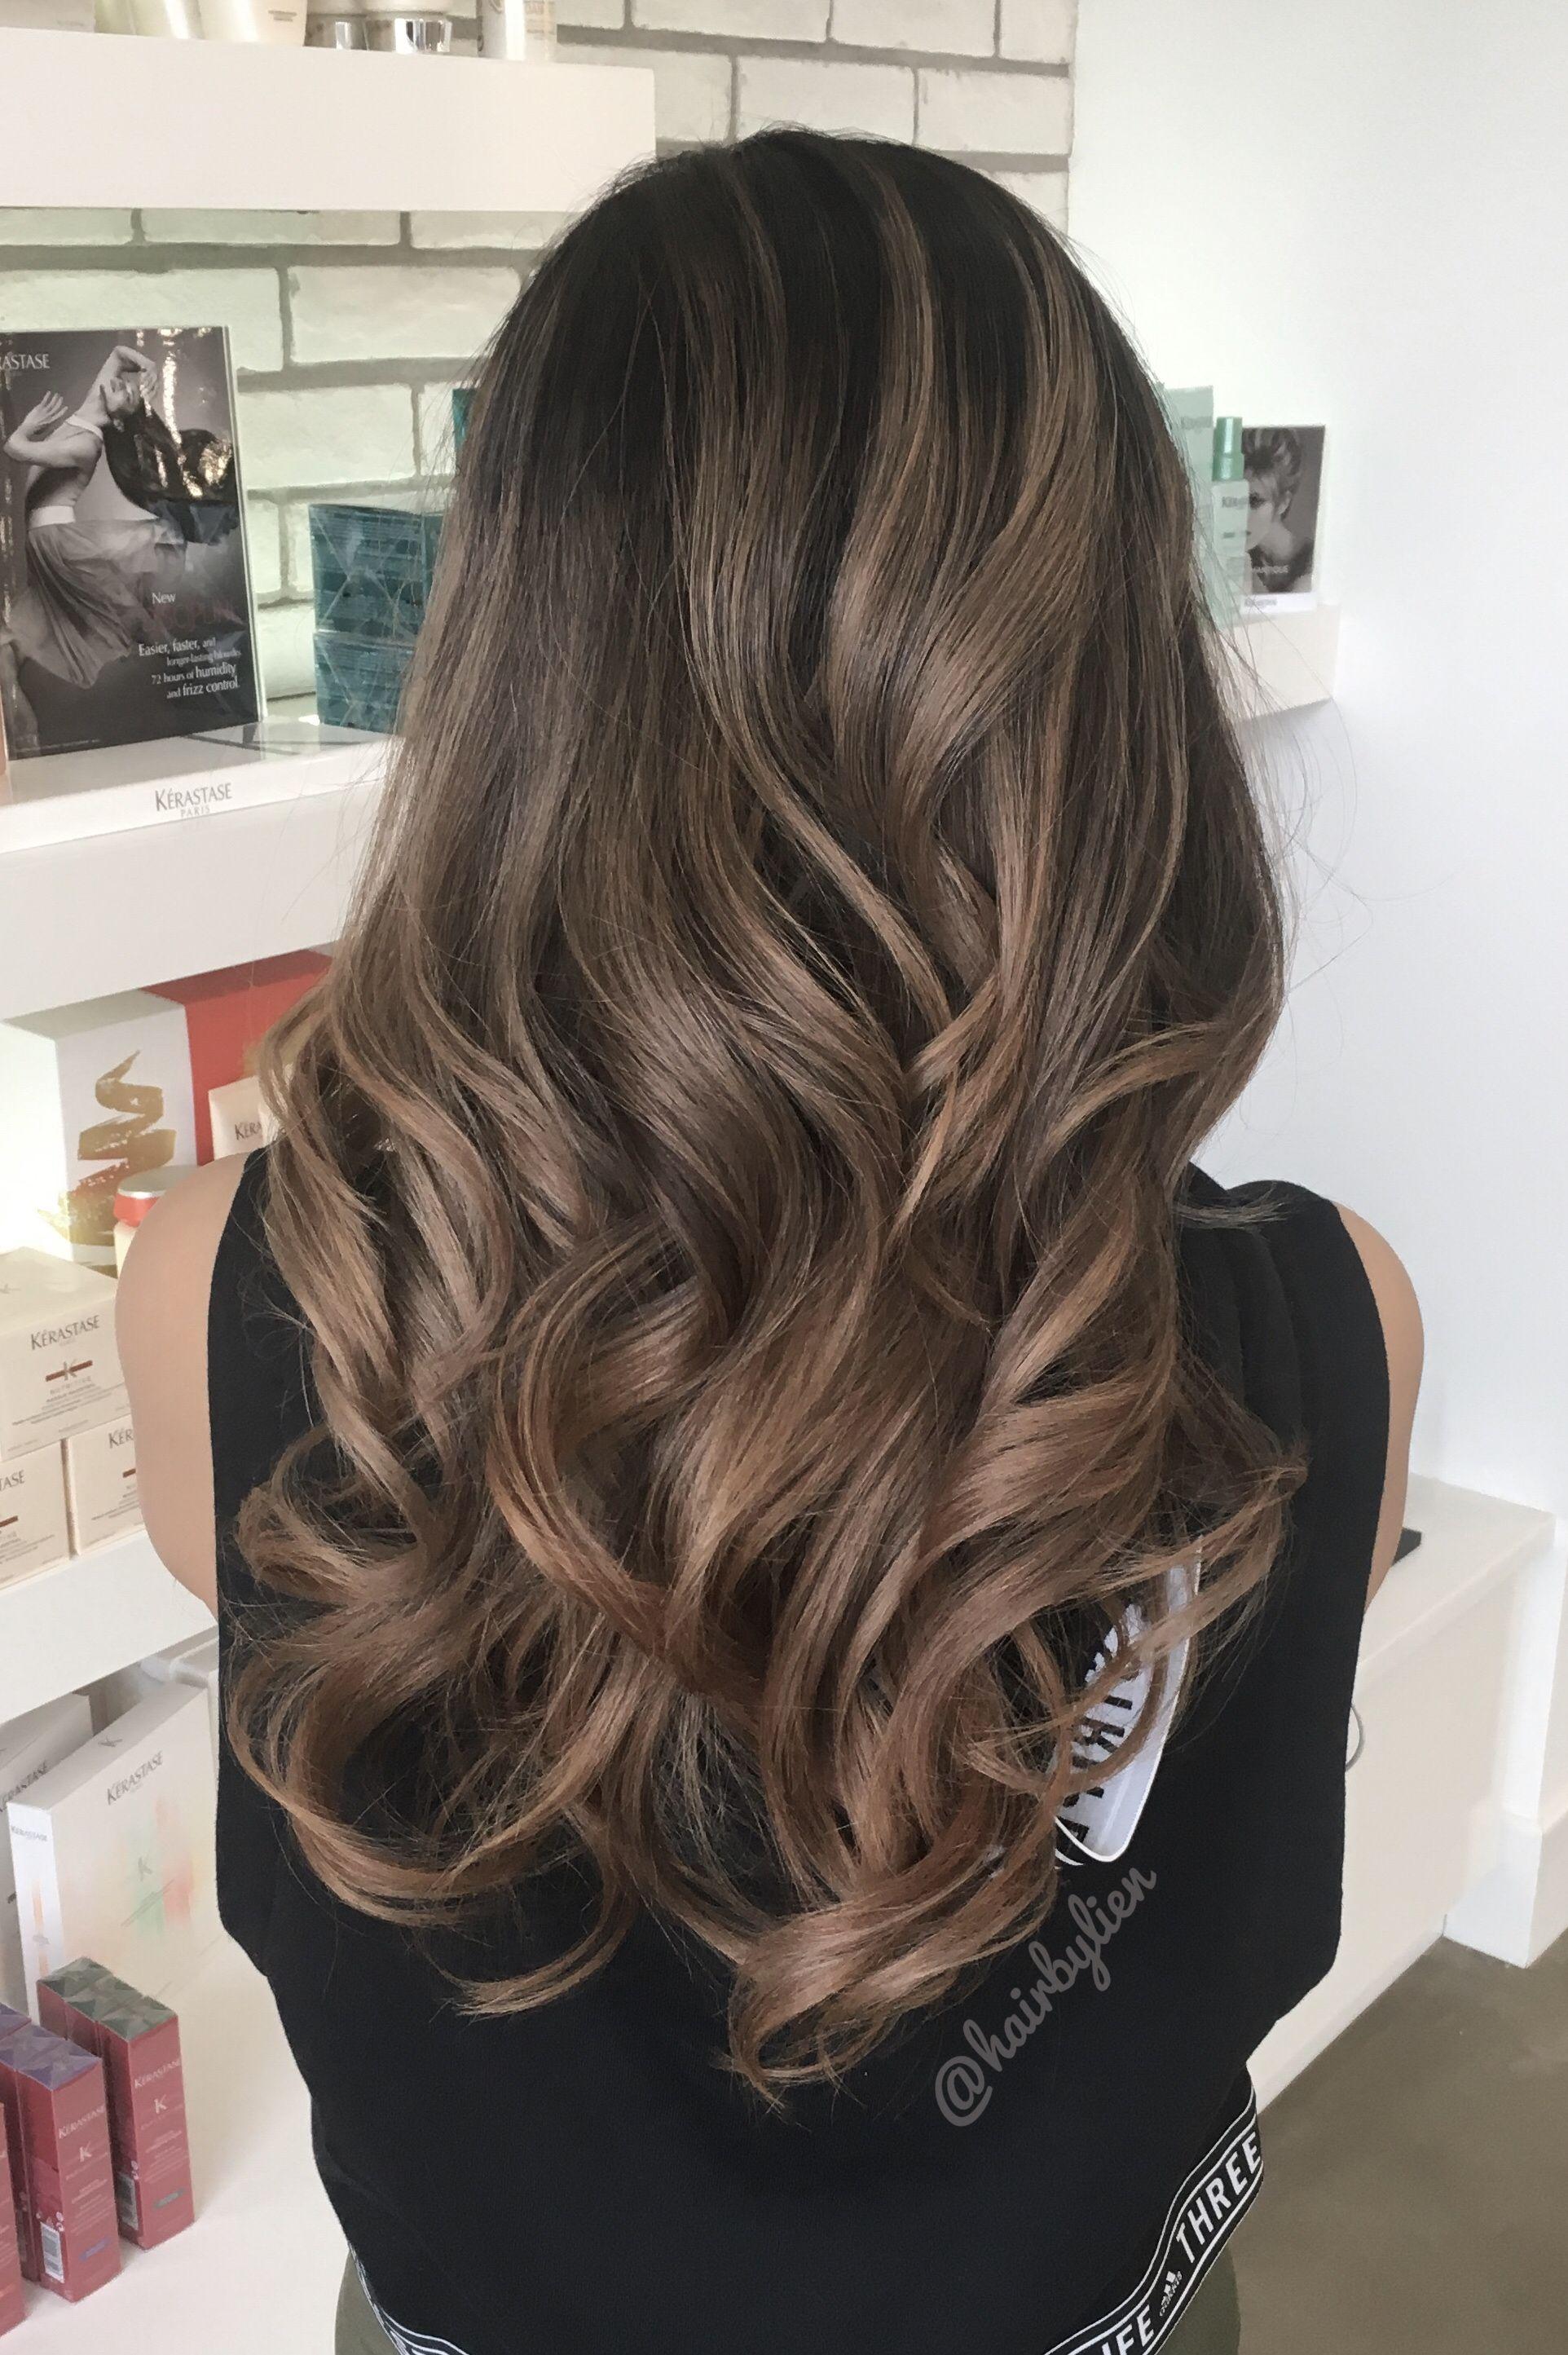 Asian Balayage Ombre Hair Color Asian Balayage Asian Hair Asian Balayage